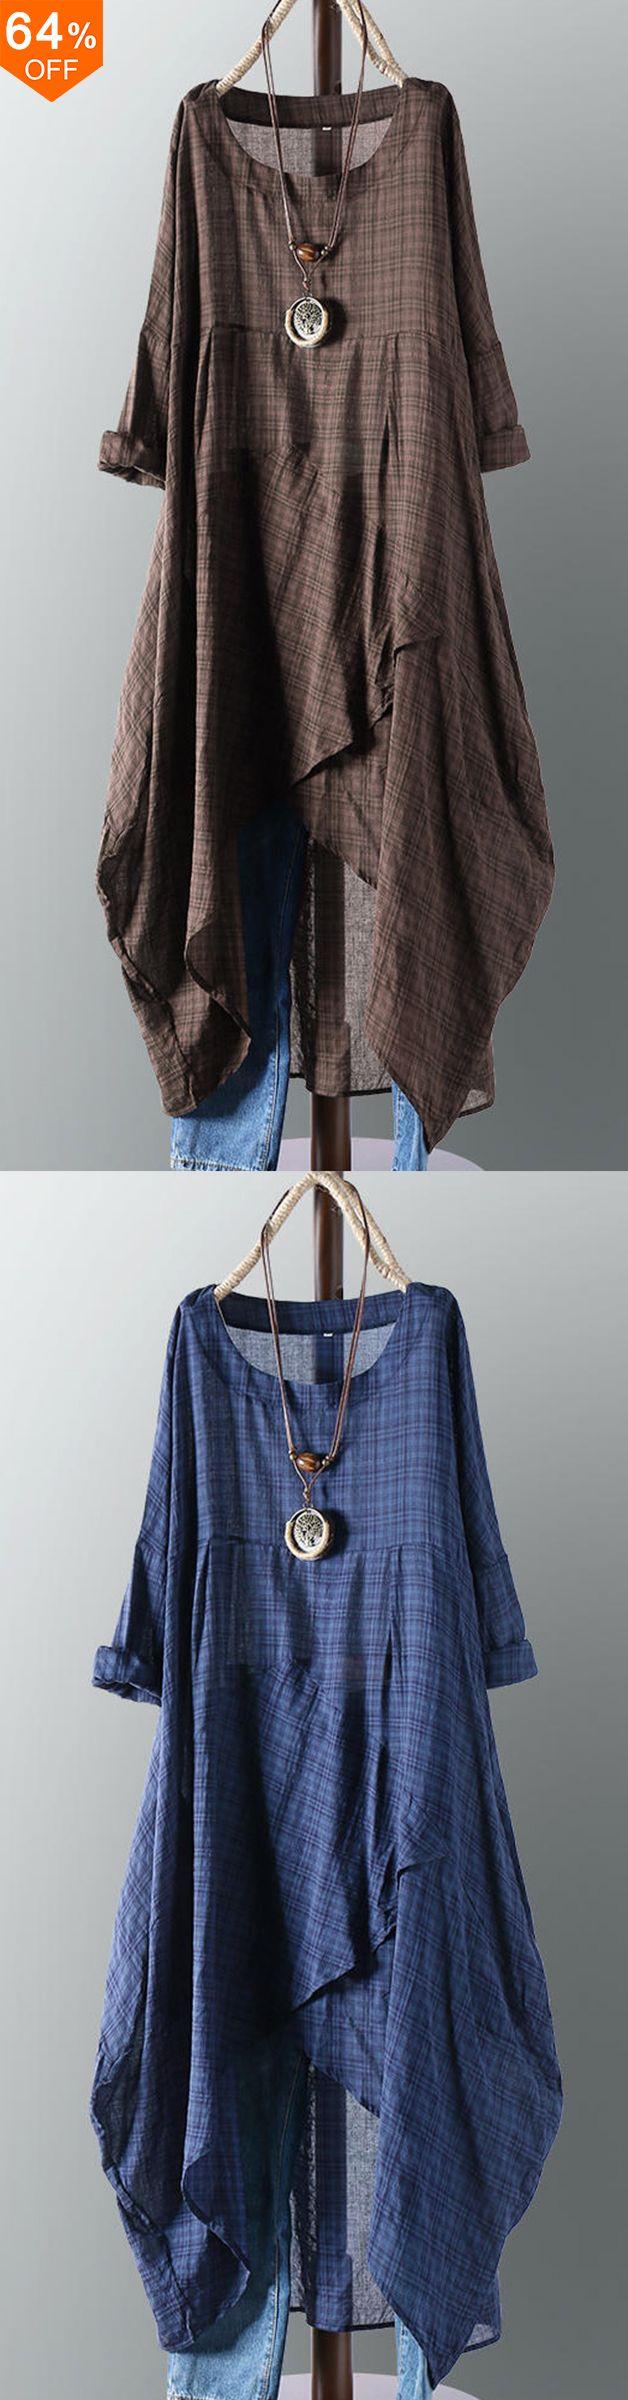 【Get it】Vintage Women Cotton Pocket Plaid Solid Color Irregular Hem Maxi Dre... 3